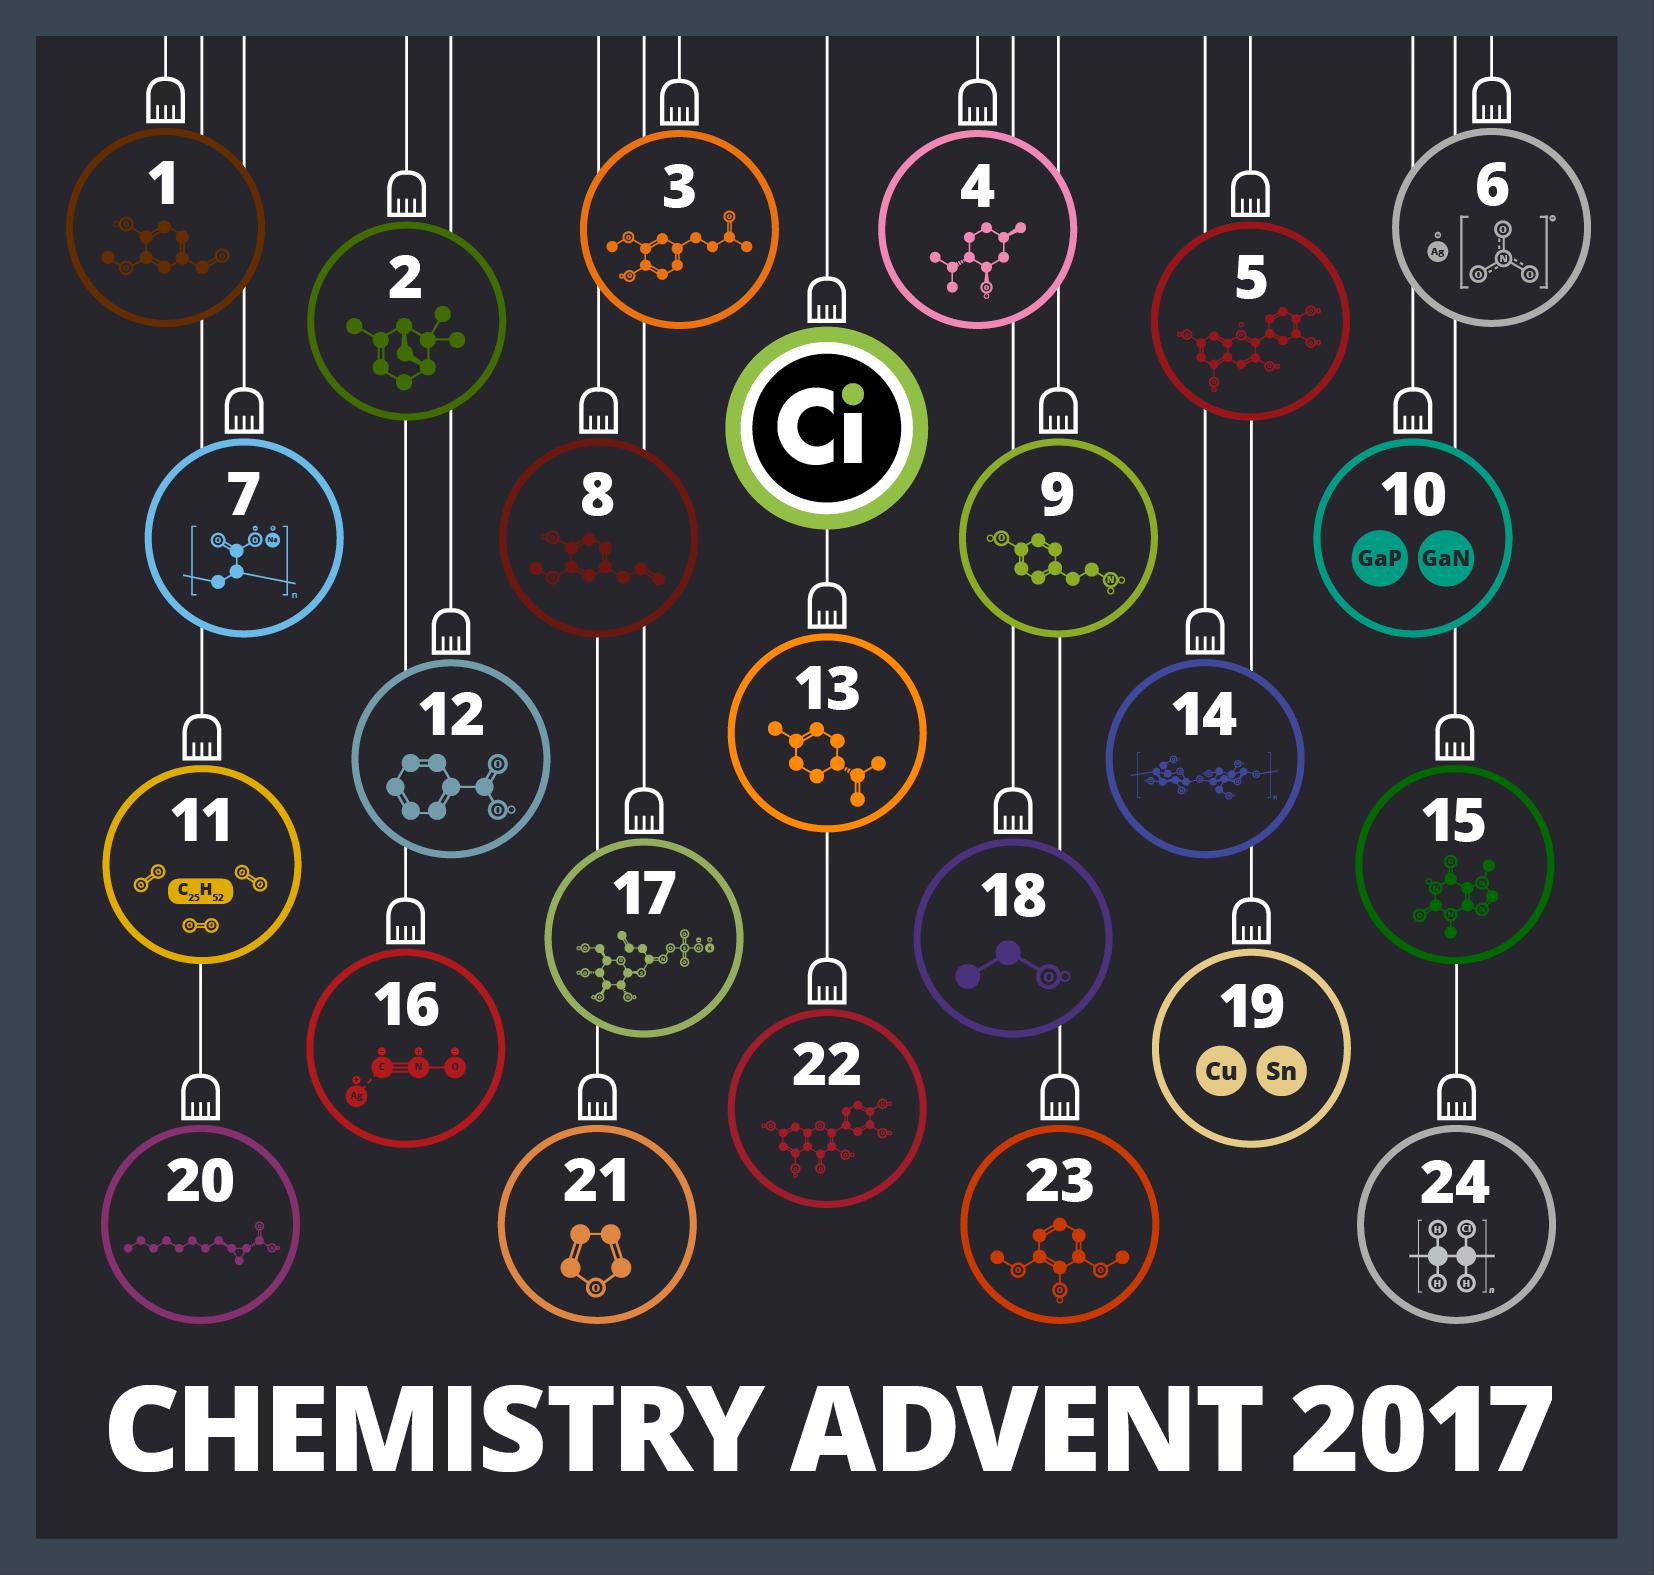 The Chemistry Advent Calendar 2017 Compound Interest